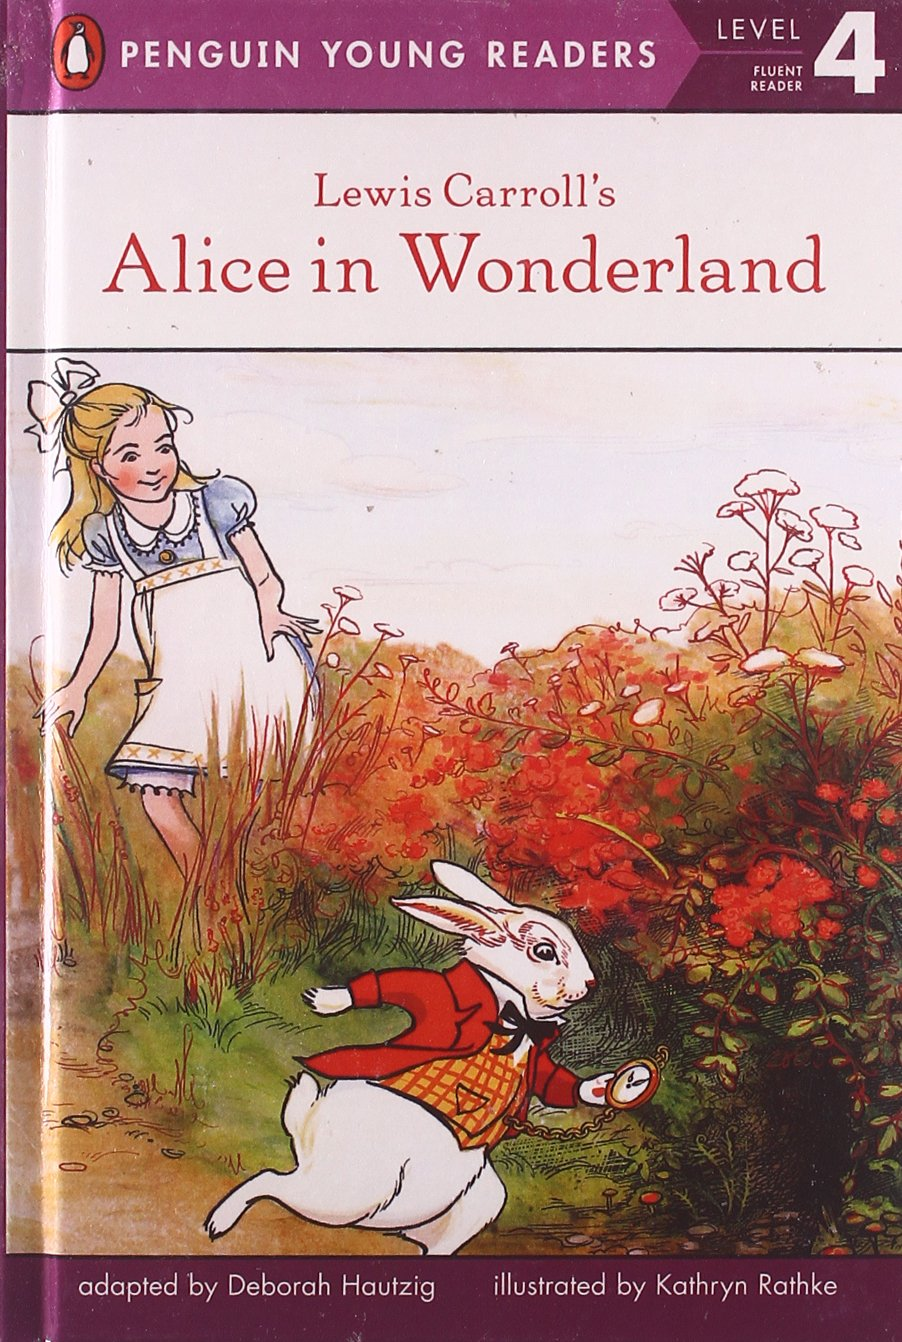 Lewis Carroll's Alice in Wonderland (Turtleback School & Library Binding Edition) (Penguin Young Readers, Level 4) ebook